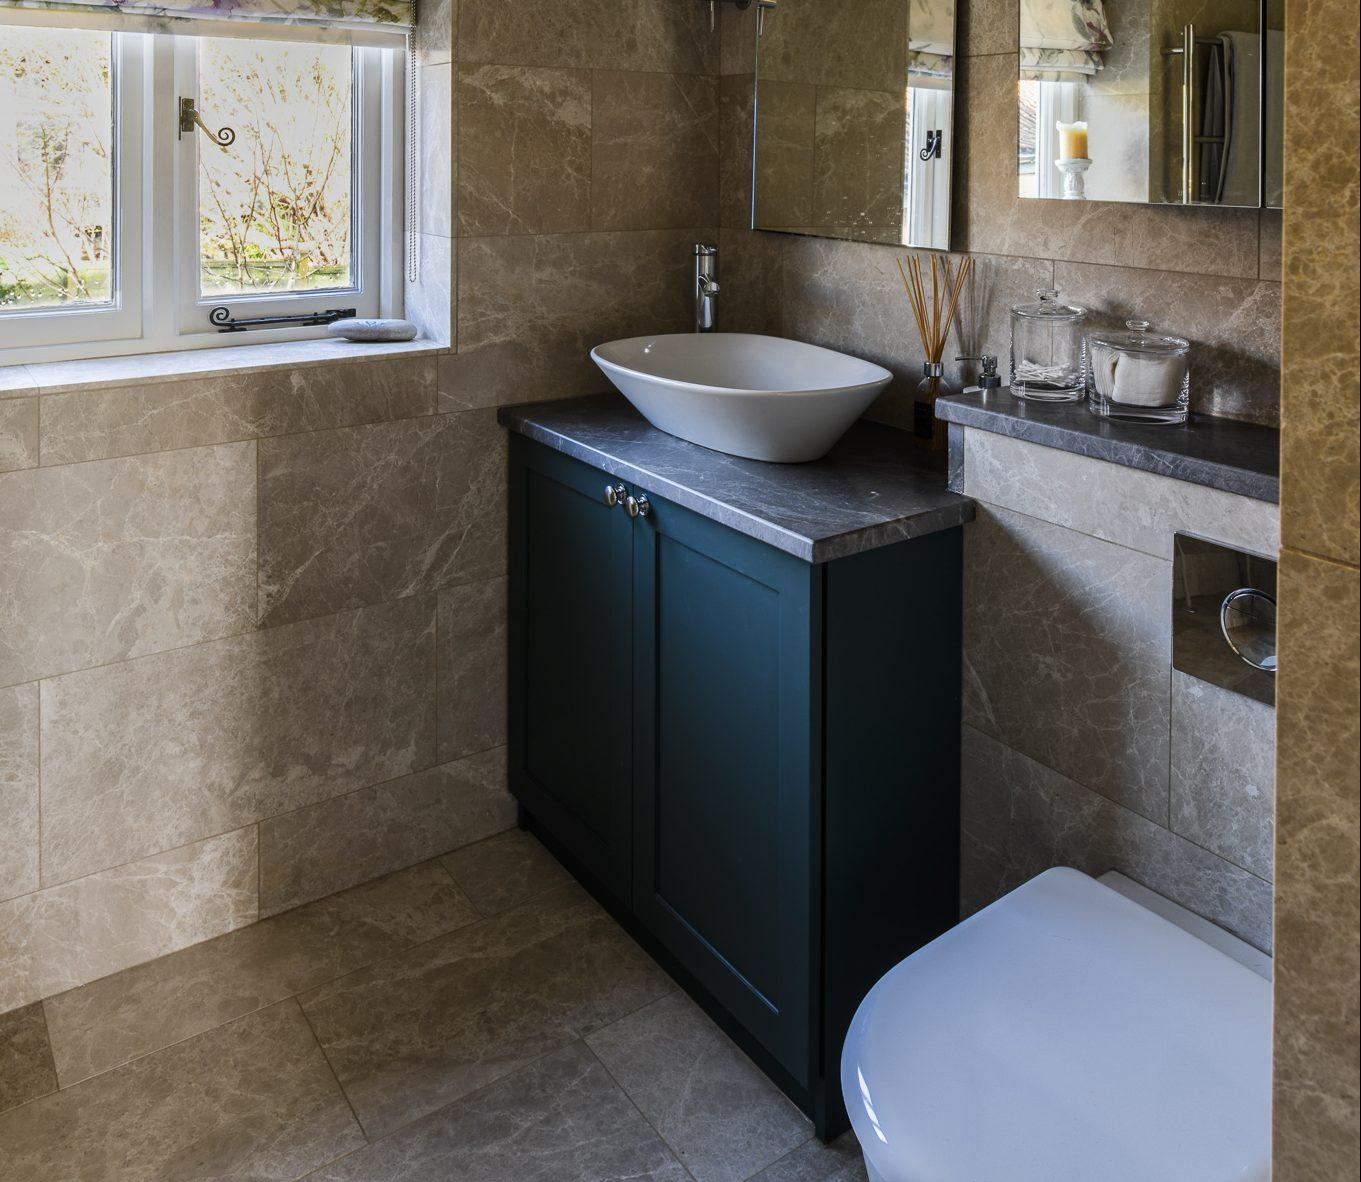 bbr 2 e1529659522667 - Bathroom Designs